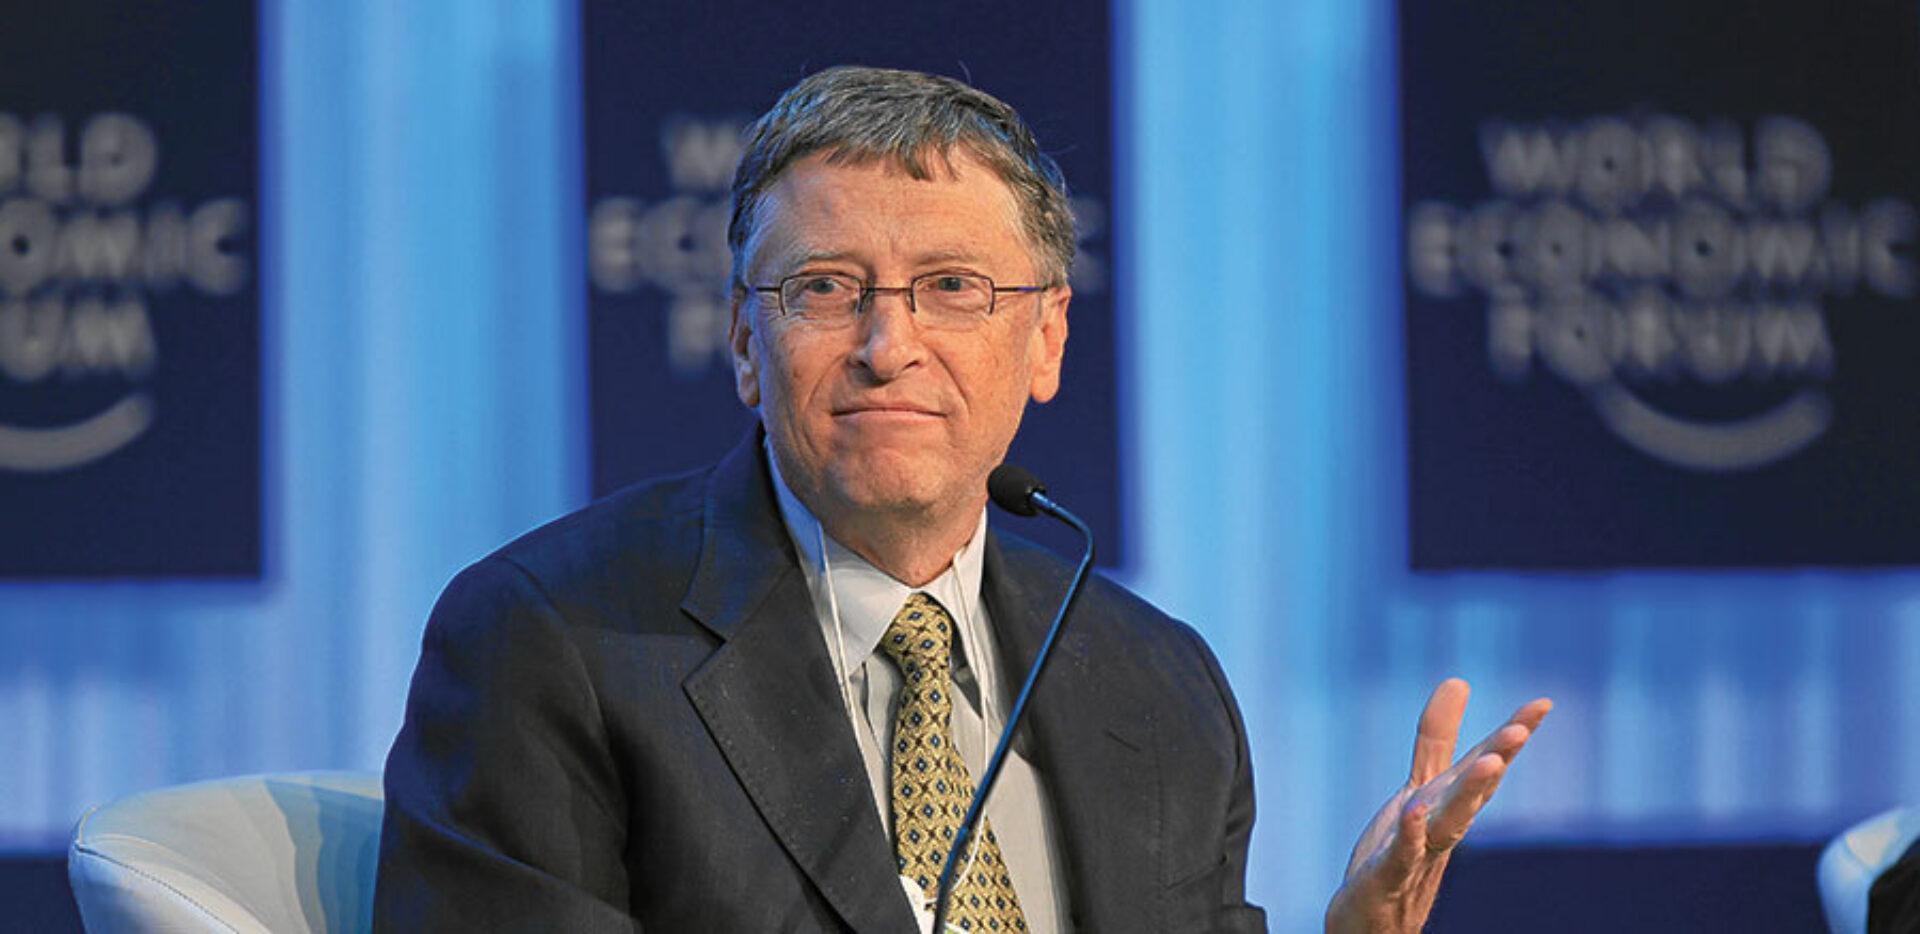 Bill Gates: filantroop of gewiekste zakenman?